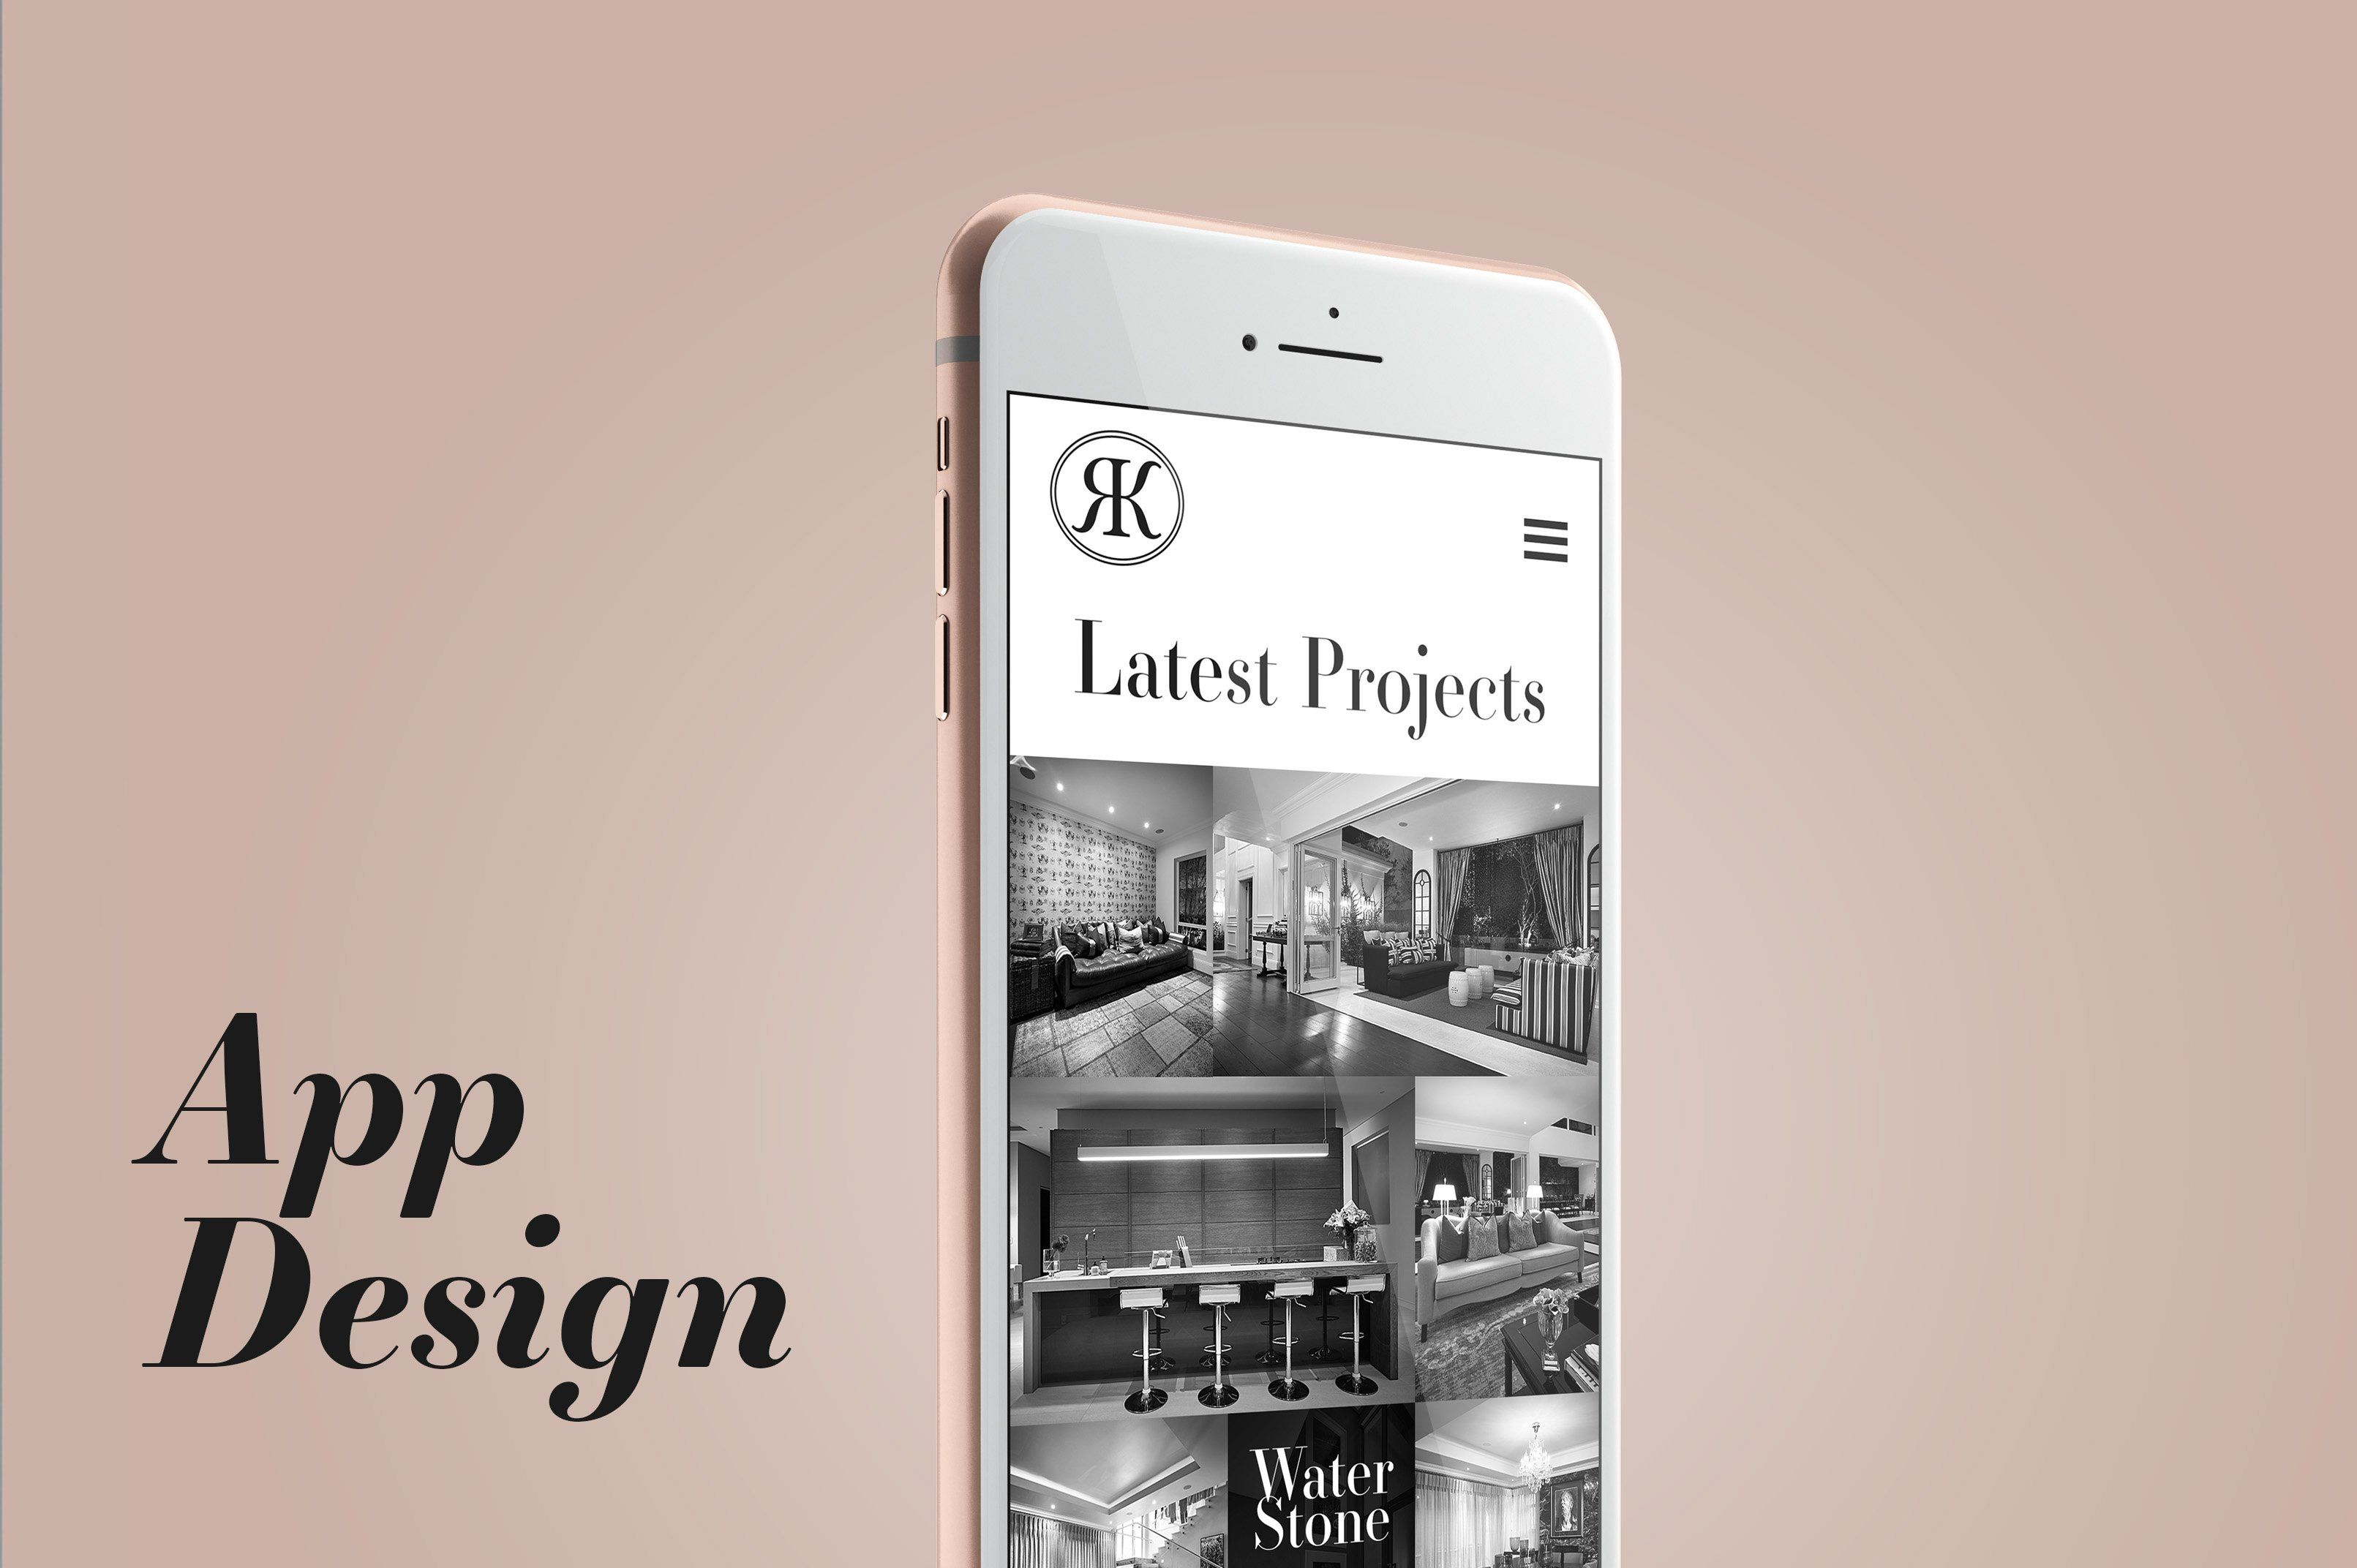 Download Iphone 8 Design Mockup Iphone 8 Design Iphone Mockup Mockup Design